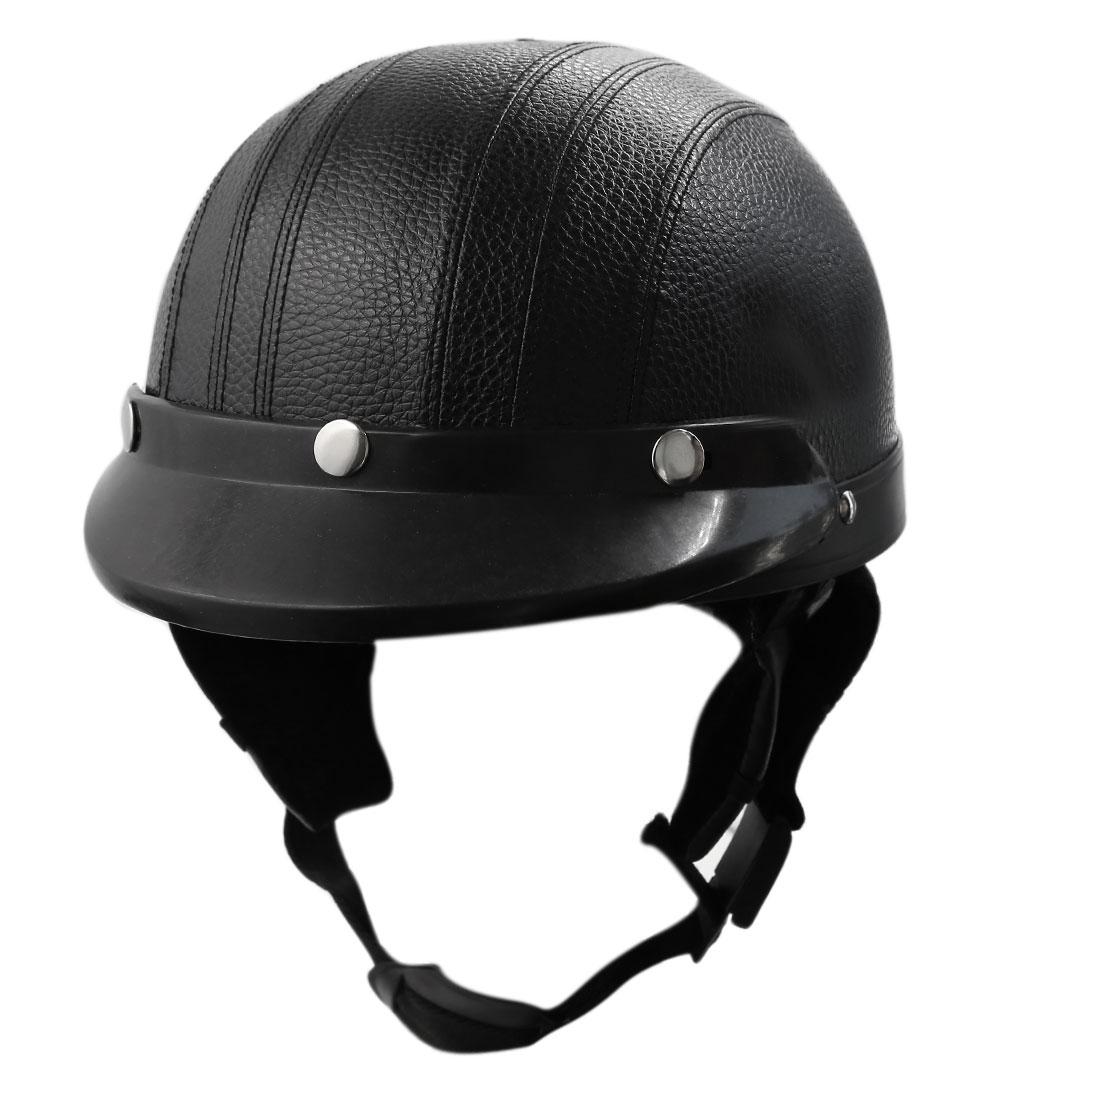 Universal Motorcycle Motorbike Scooter Visor Helemt Adult Head Protector Black